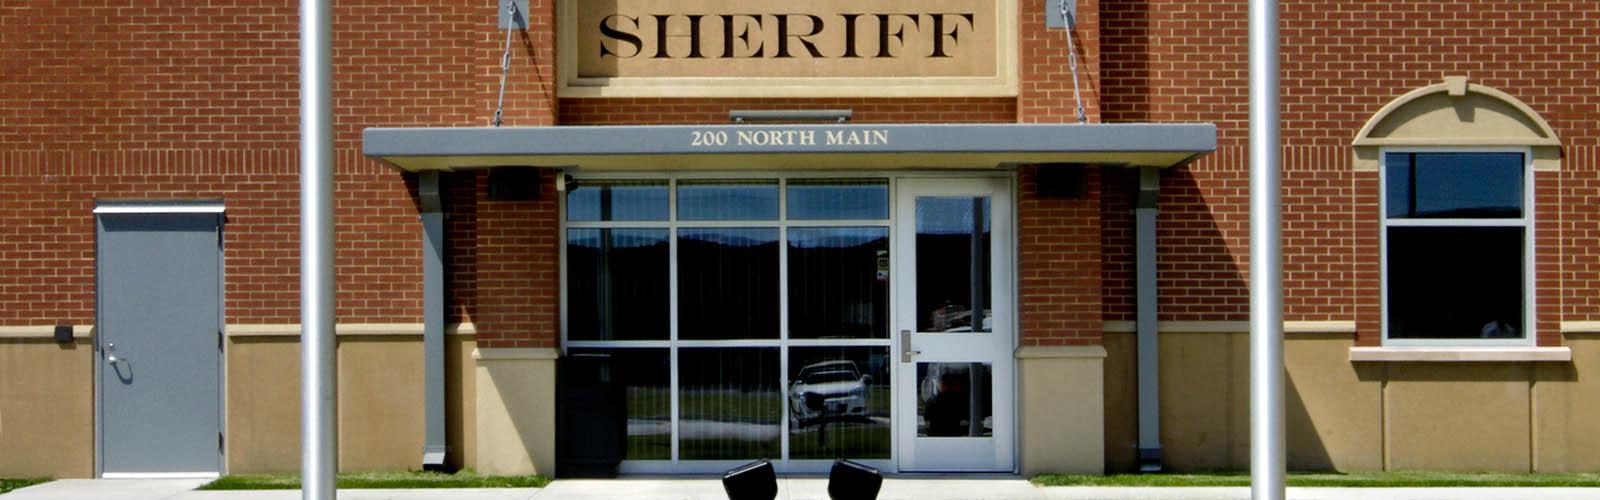 Henry County Detention Center 4